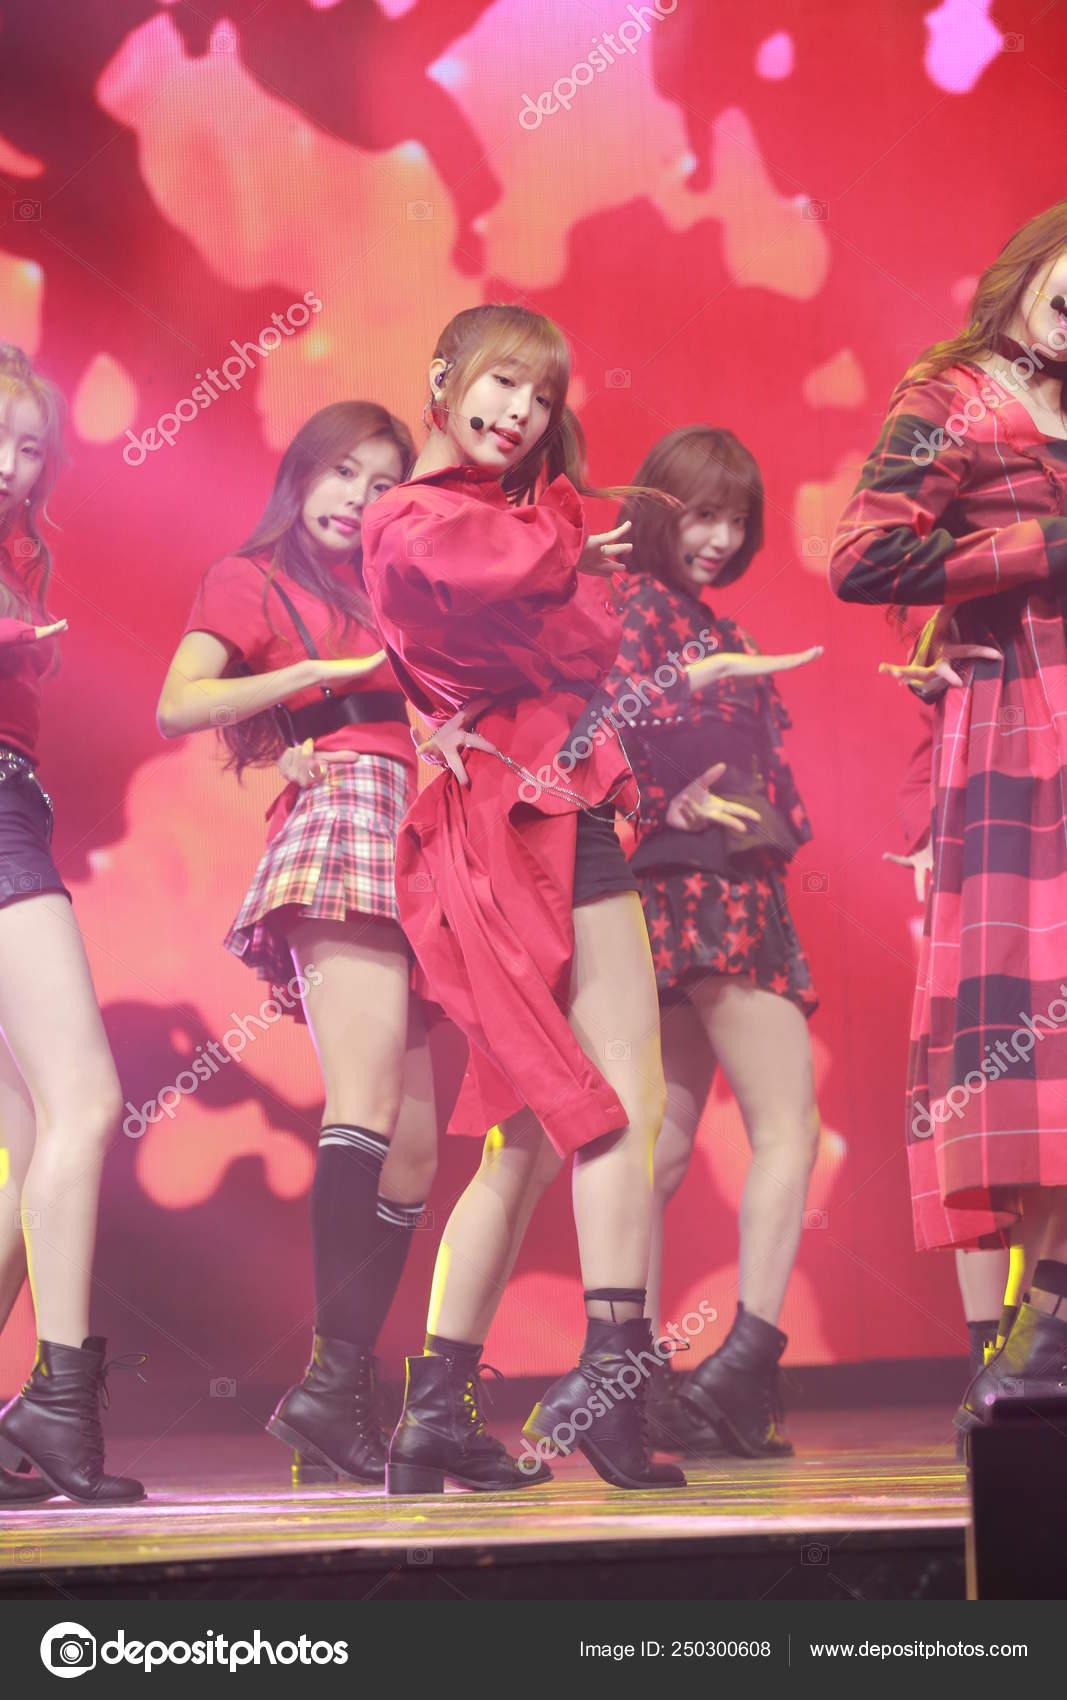 SOUTH KOREA SEOUL ALBUM COLOR*IZ GIRL IZONE – Stock Editorial Photo